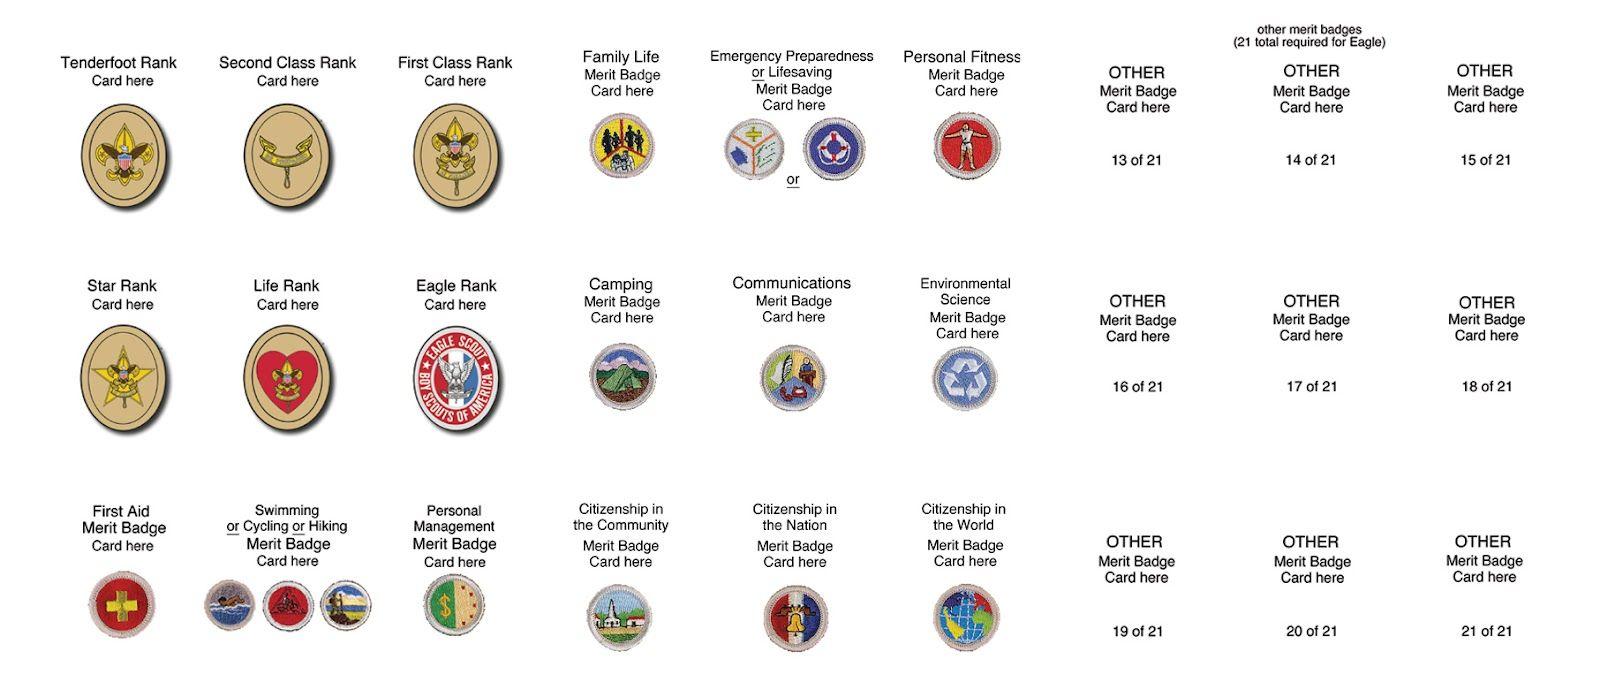 worksheet Kayaking Merit Badge Worksheet scout organizing of merit badges http1 bp blogspot com l4l5lsio5scubtjnywzfhiaaaaaaaaduo2oqq2qtjgl8s1600handy meritbadgeprint